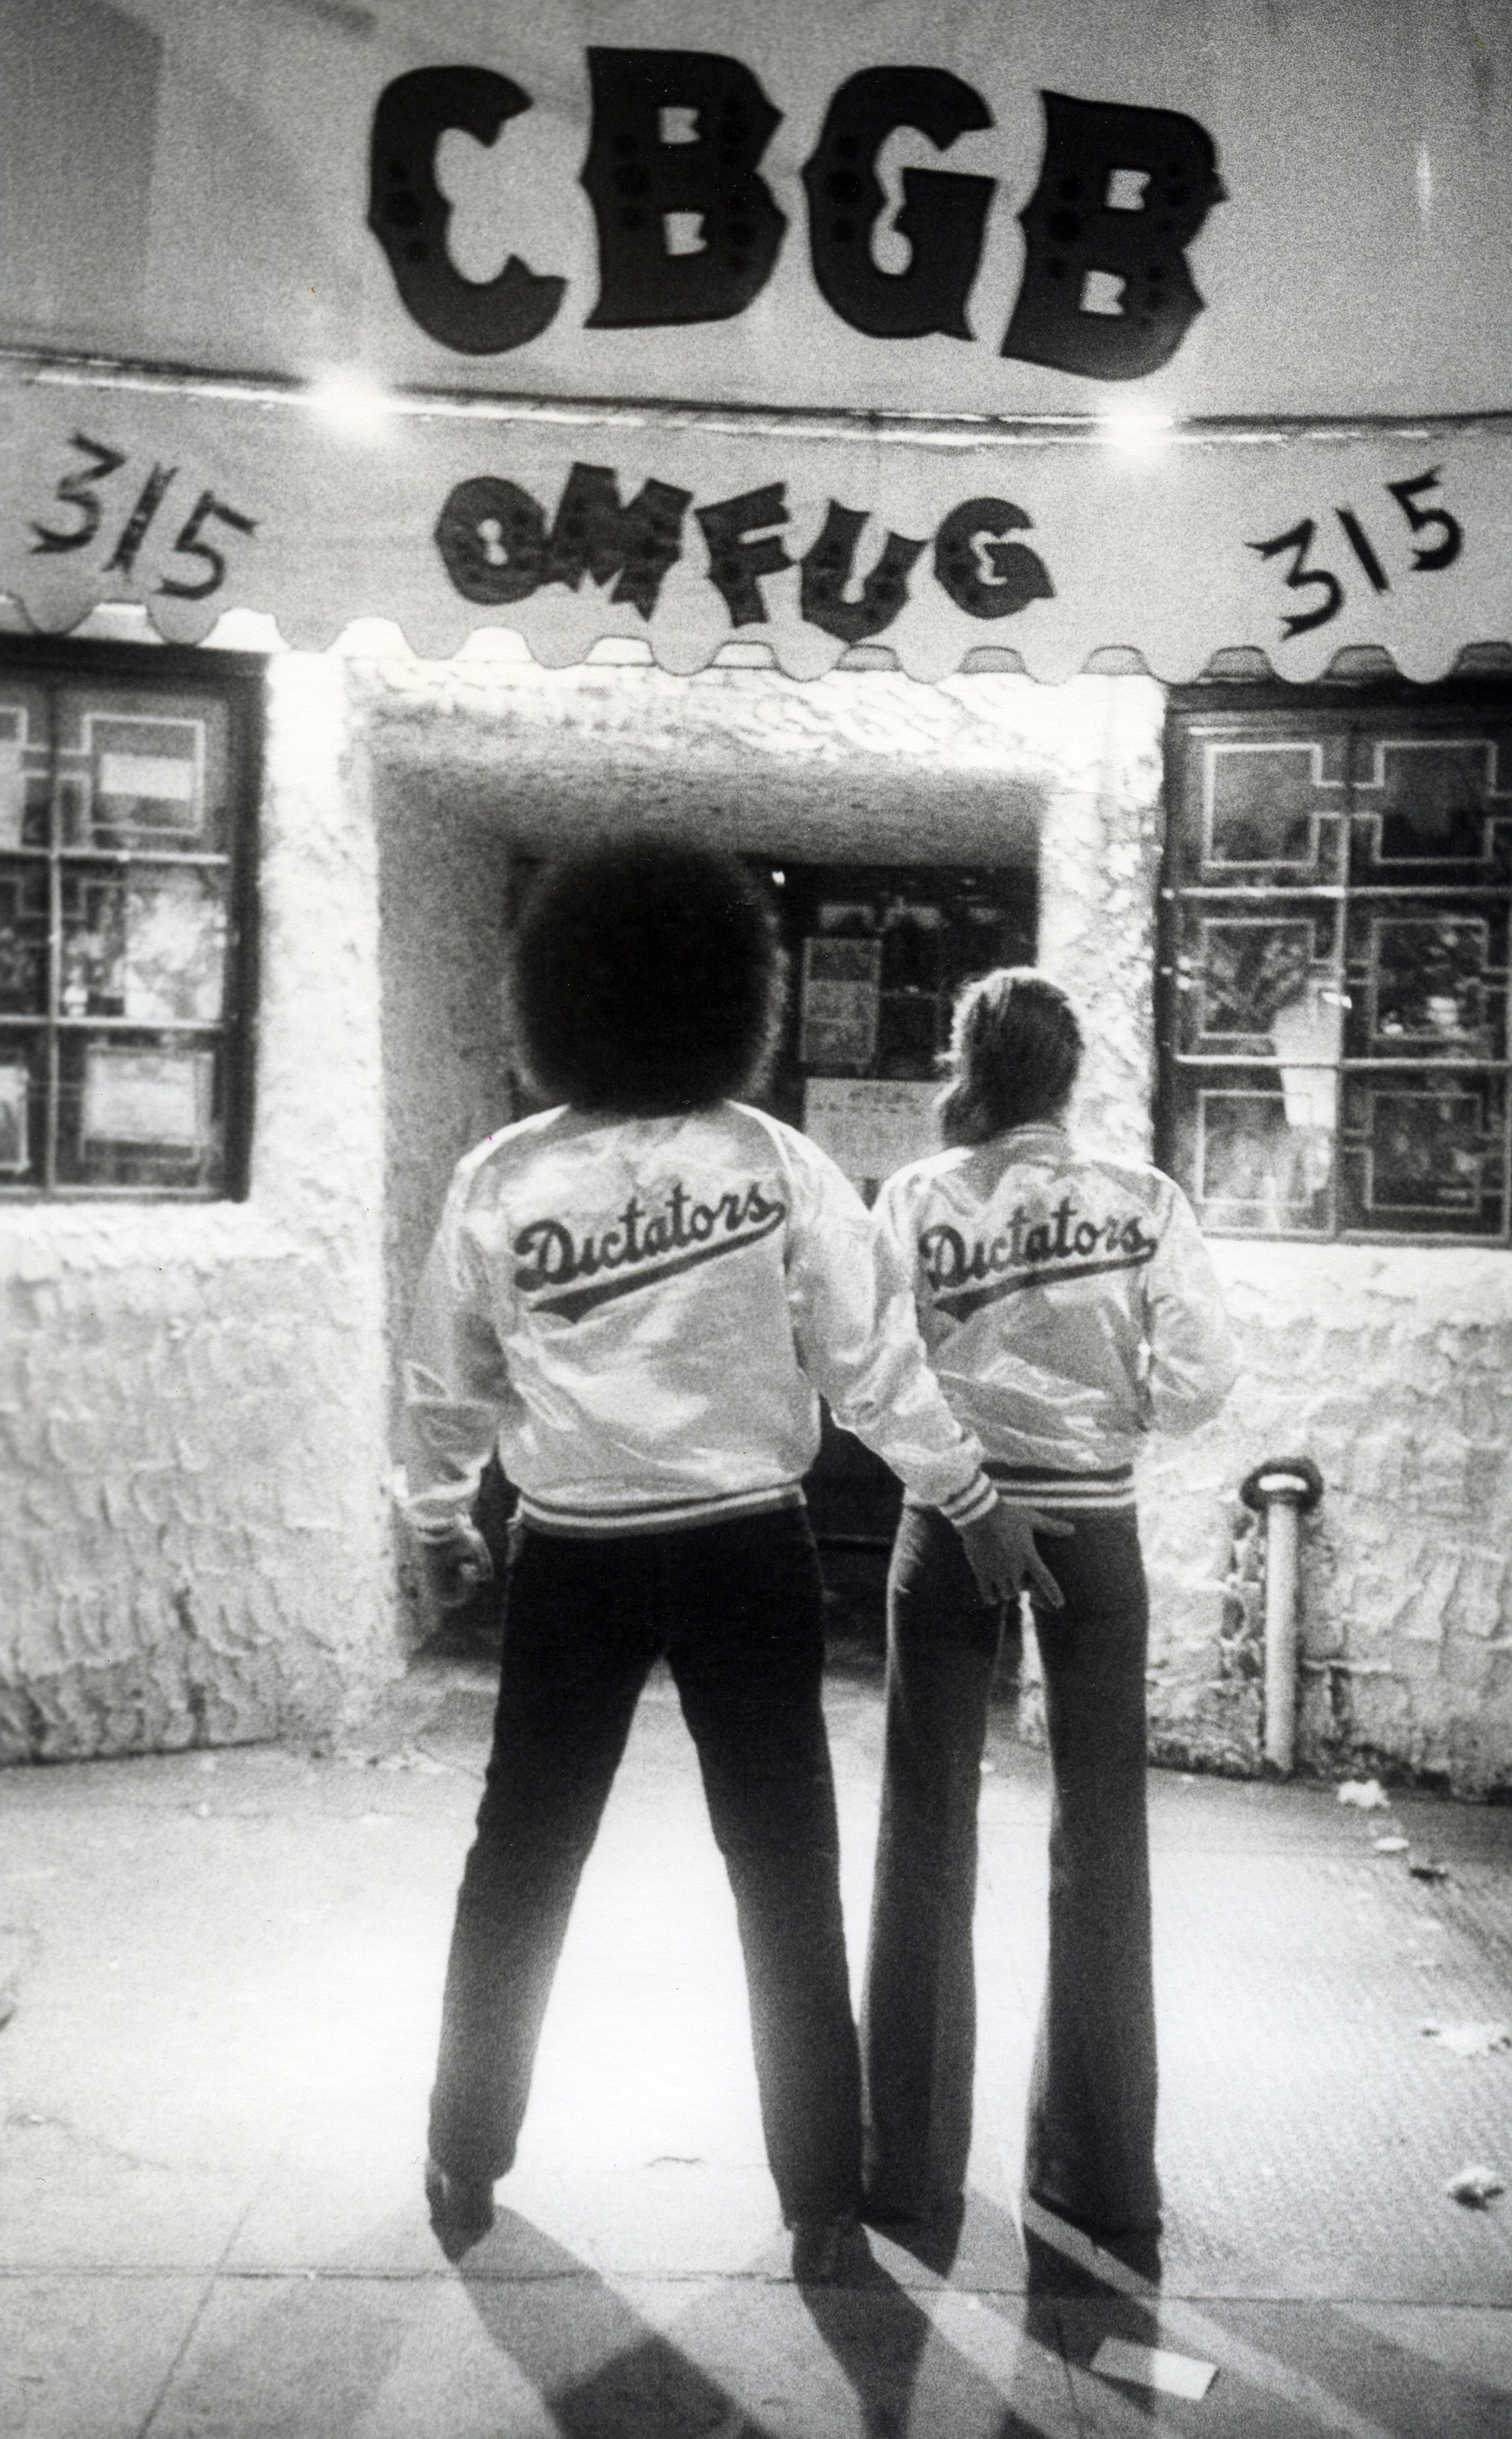 Dictators, Bowery 1976